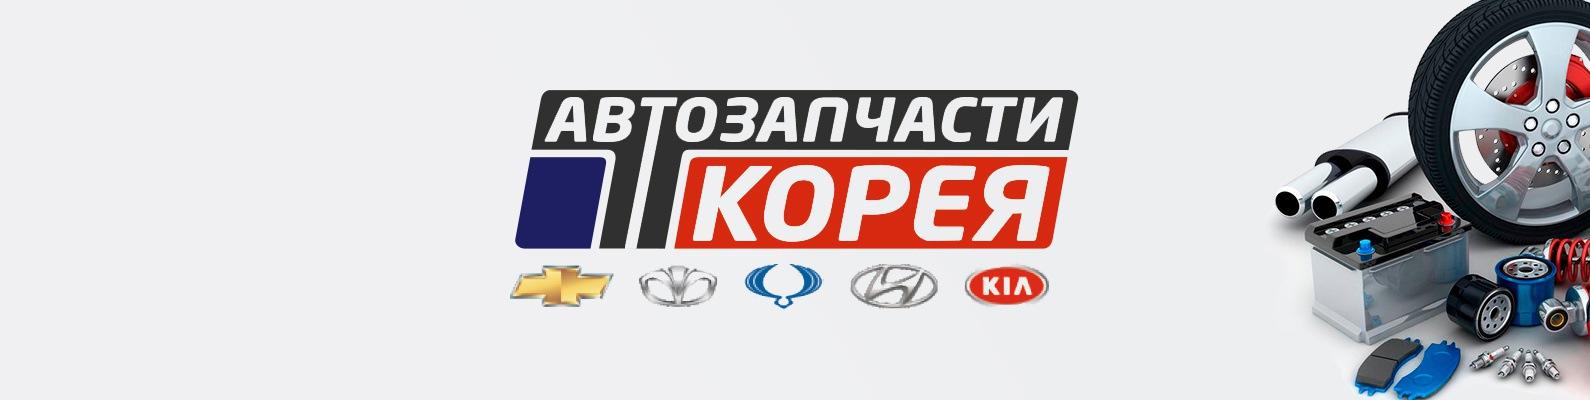 Запчасти на корейские автомобили